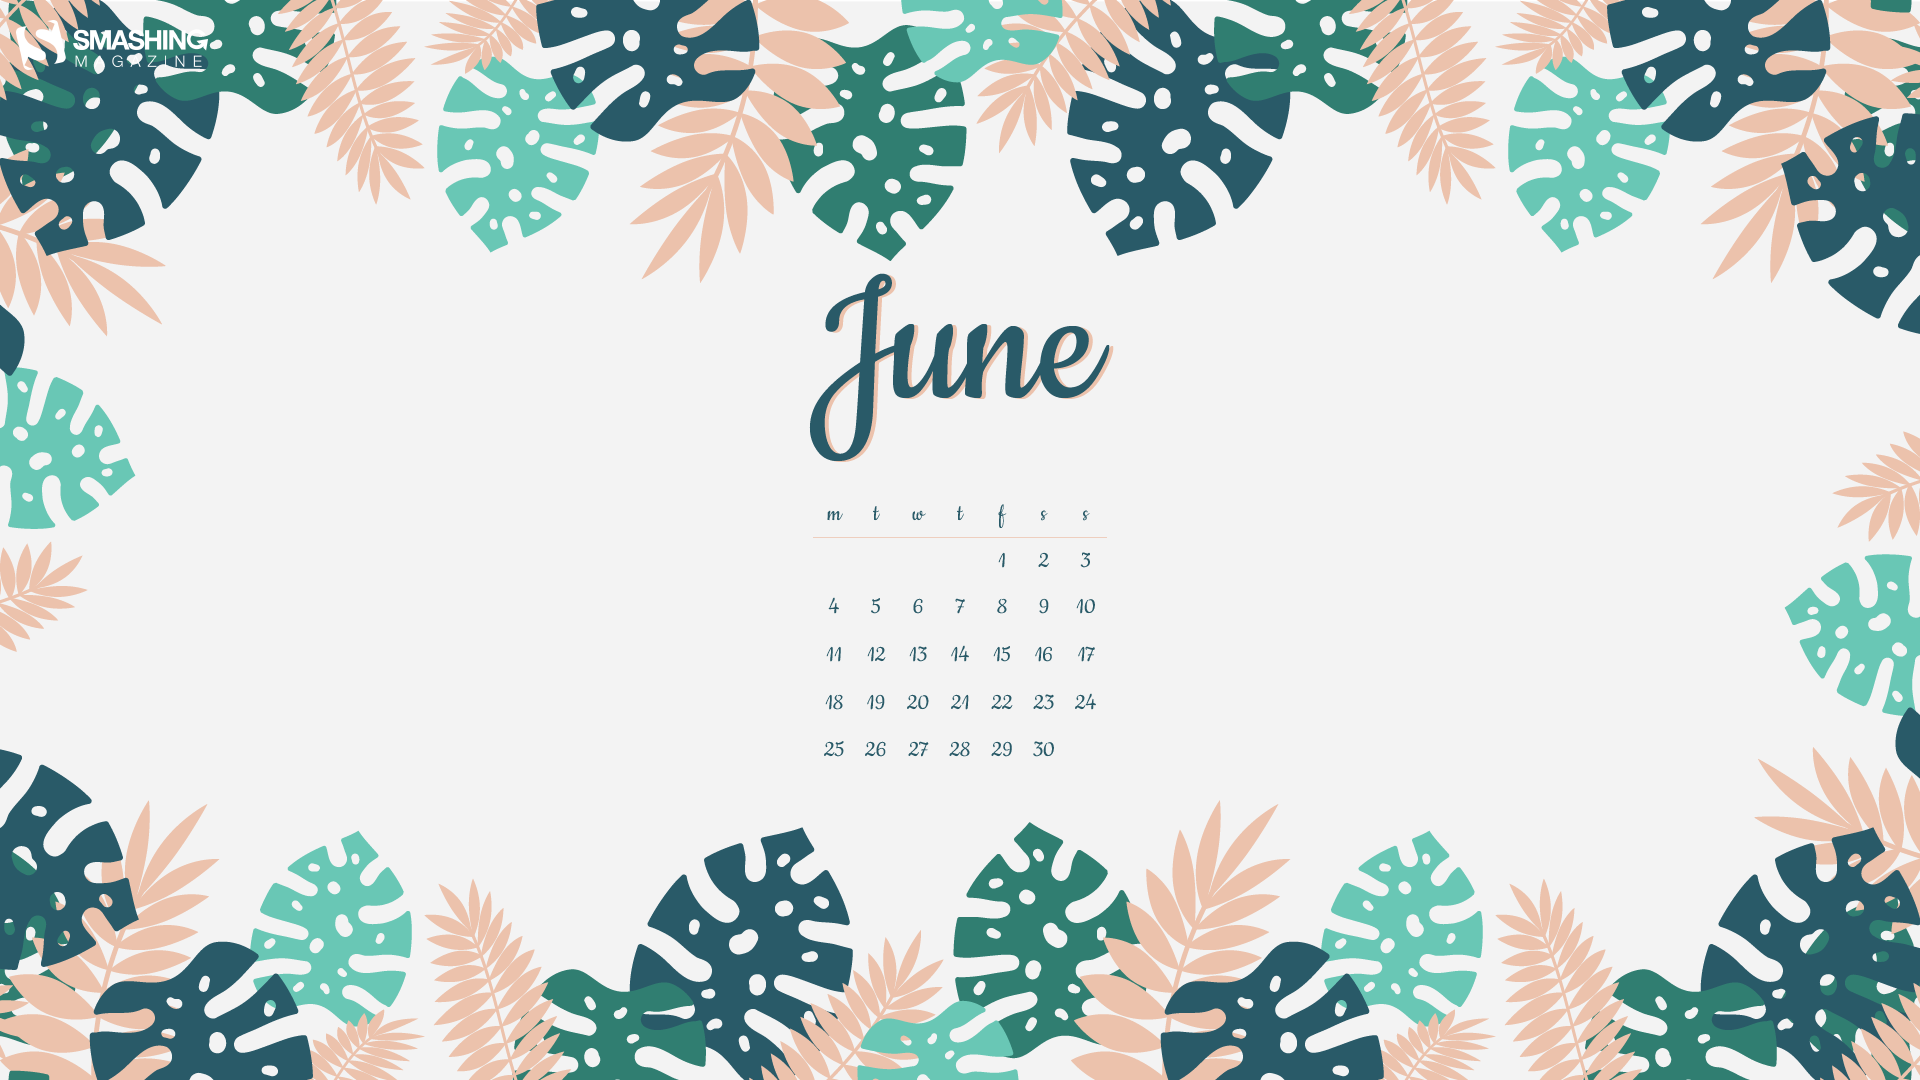 June 2019 Floral Calendar Wallpaper